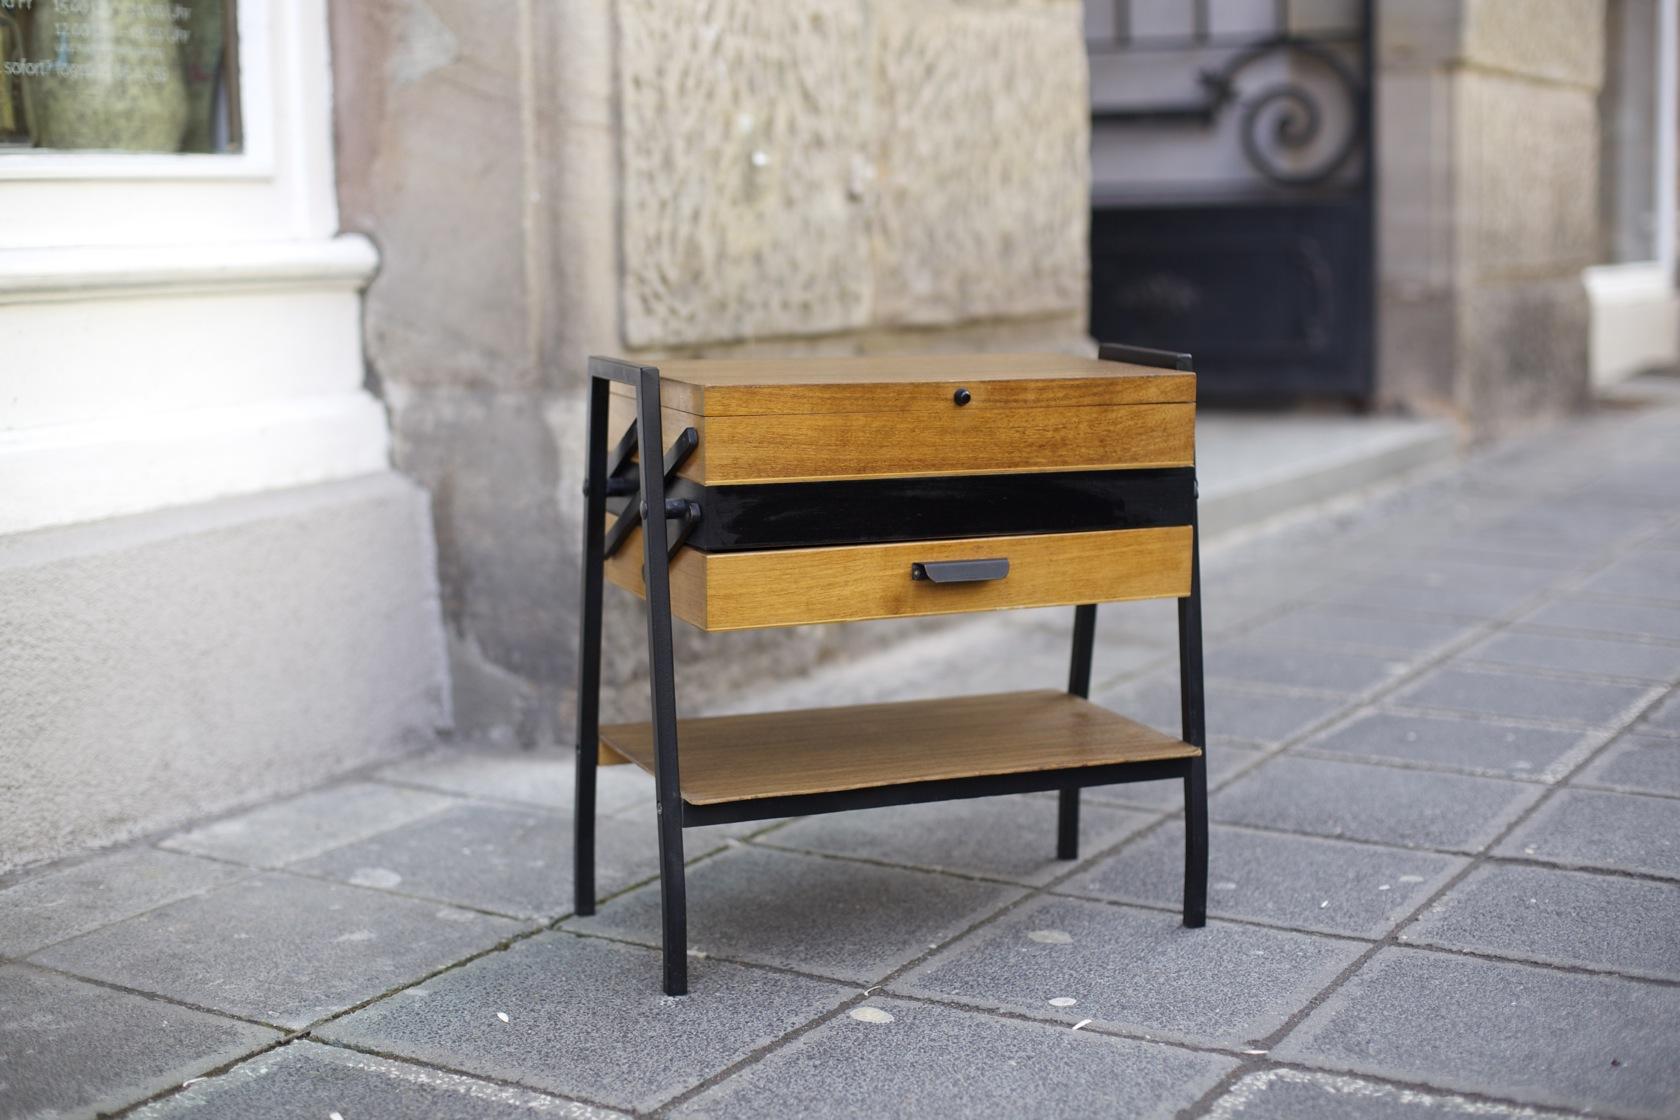 n hk stchen aus den 50er jahren raumwunder vintage. Black Bedroom Furniture Sets. Home Design Ideas